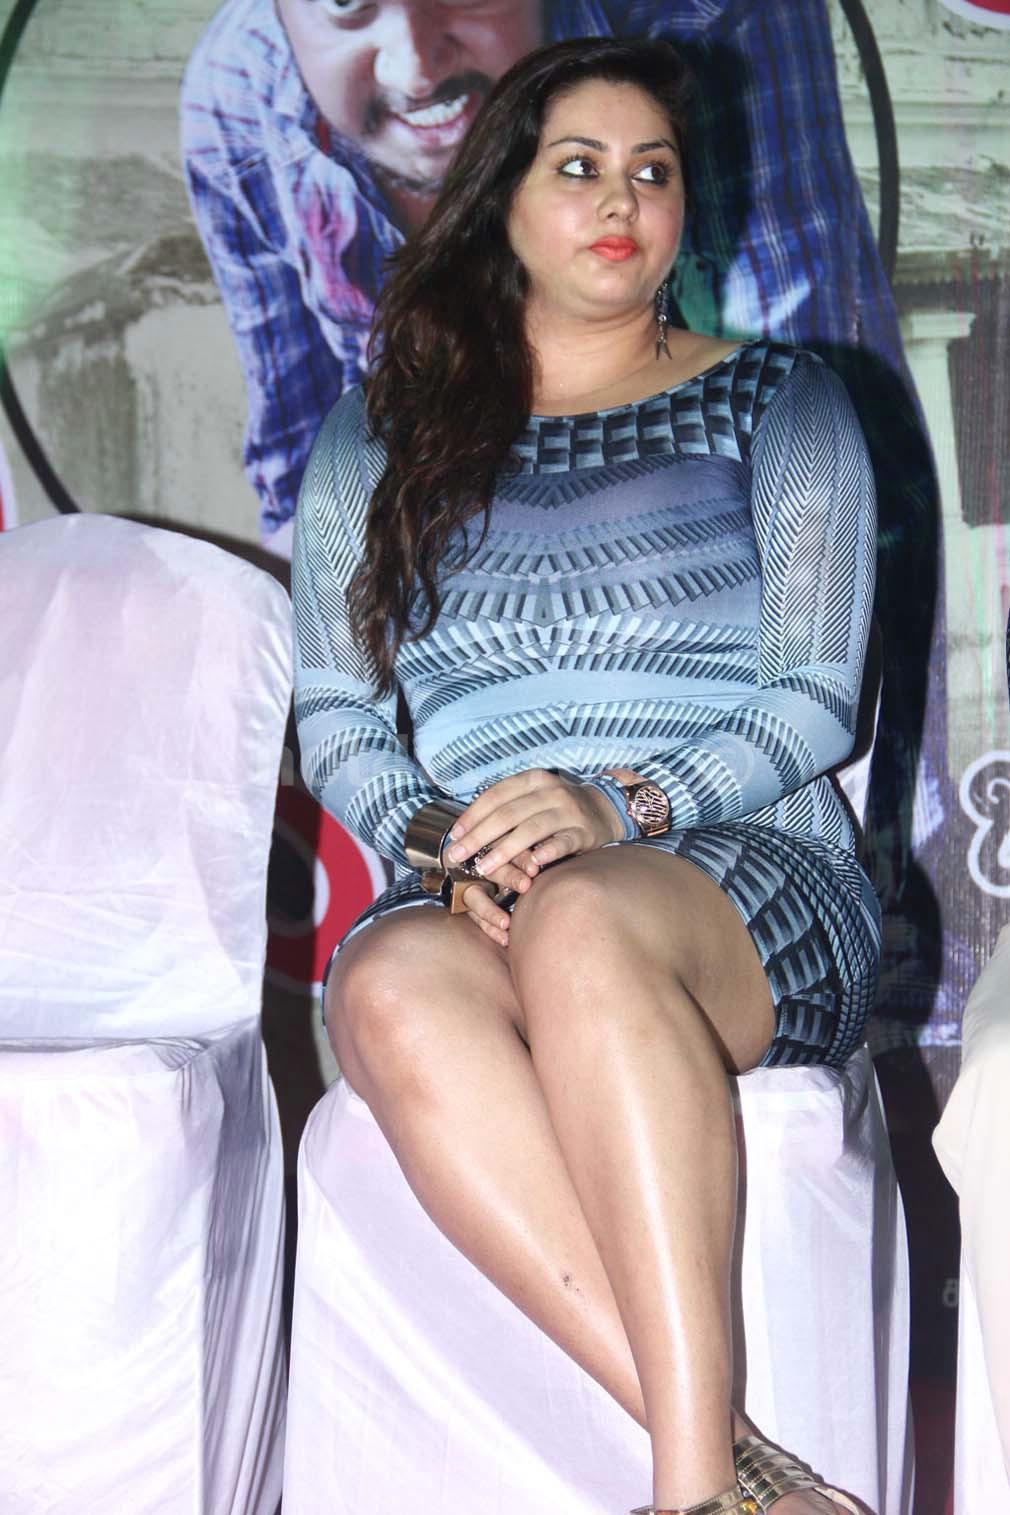 hot namitha stills: namitha hot photos